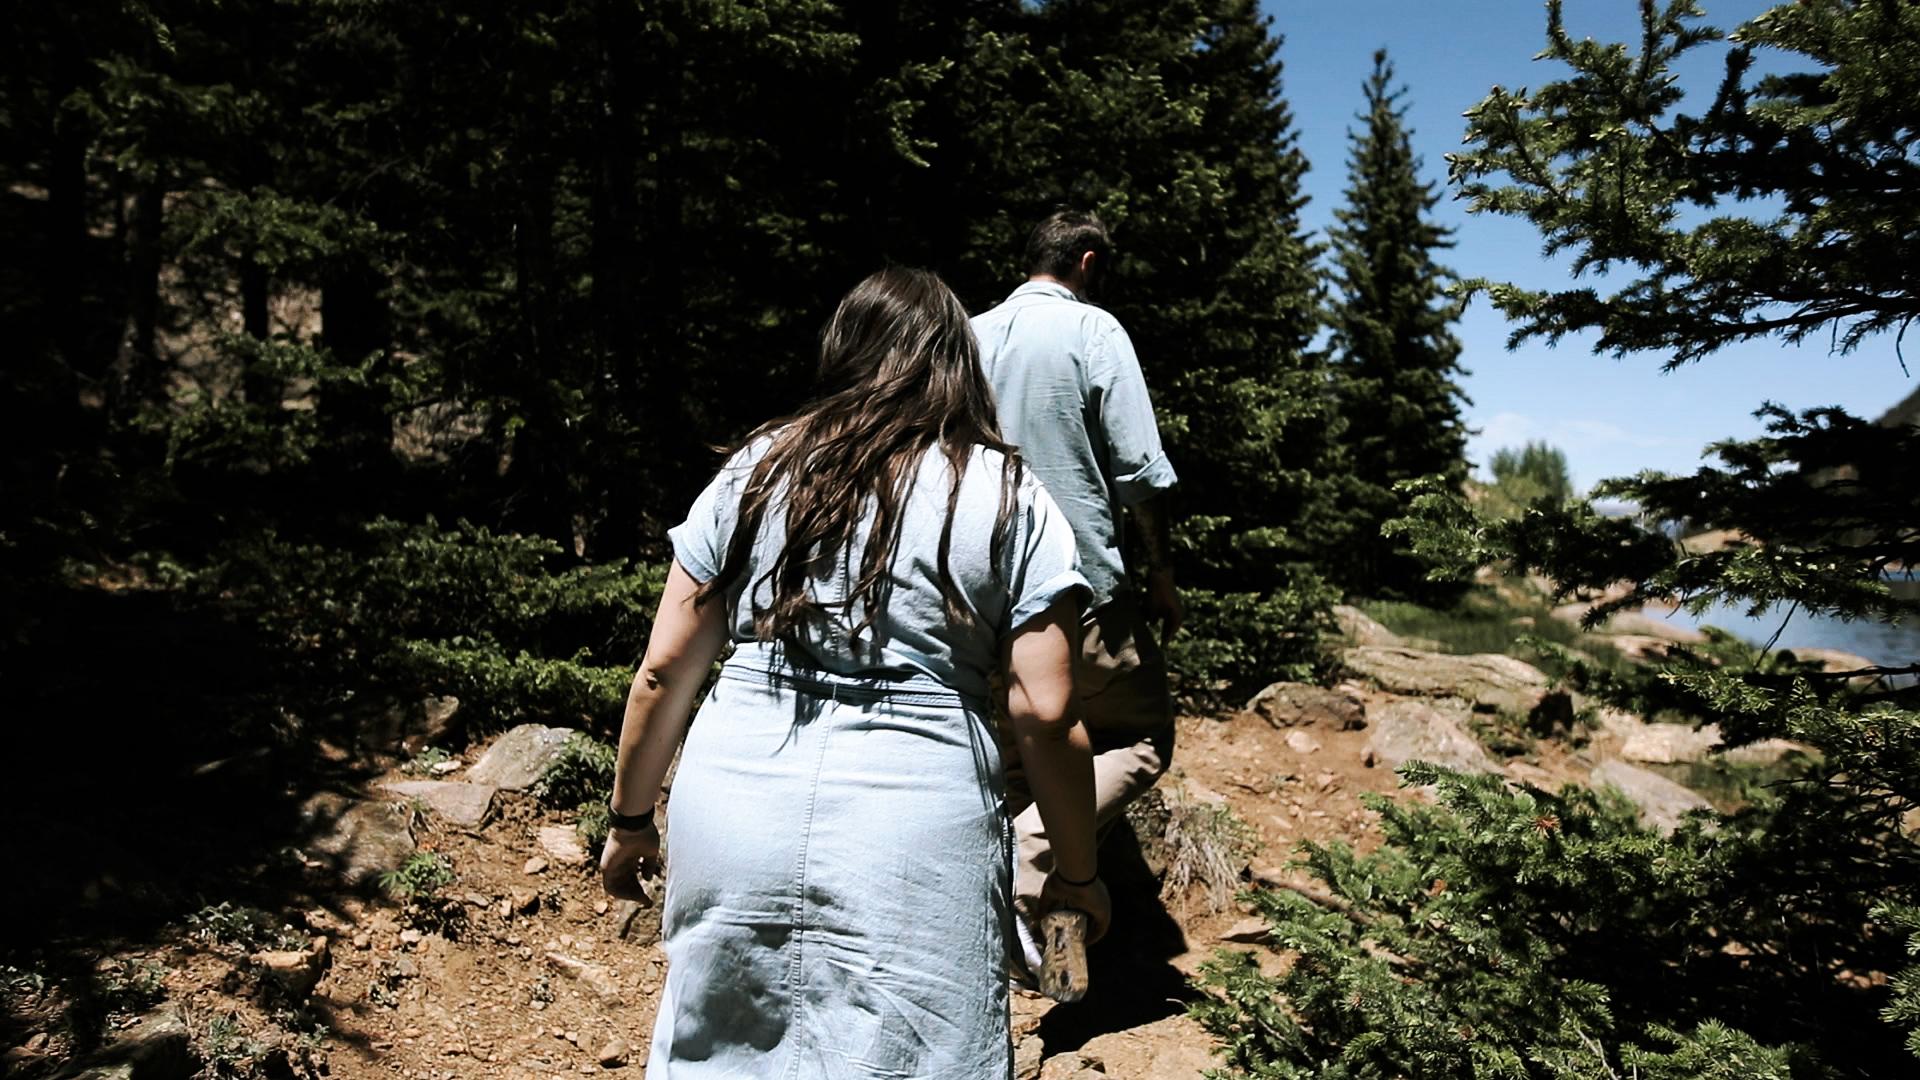 Secret Colorado Mountaintop Elopement   Colorado Elopement Photographer + Videographer   Vow of the Wild